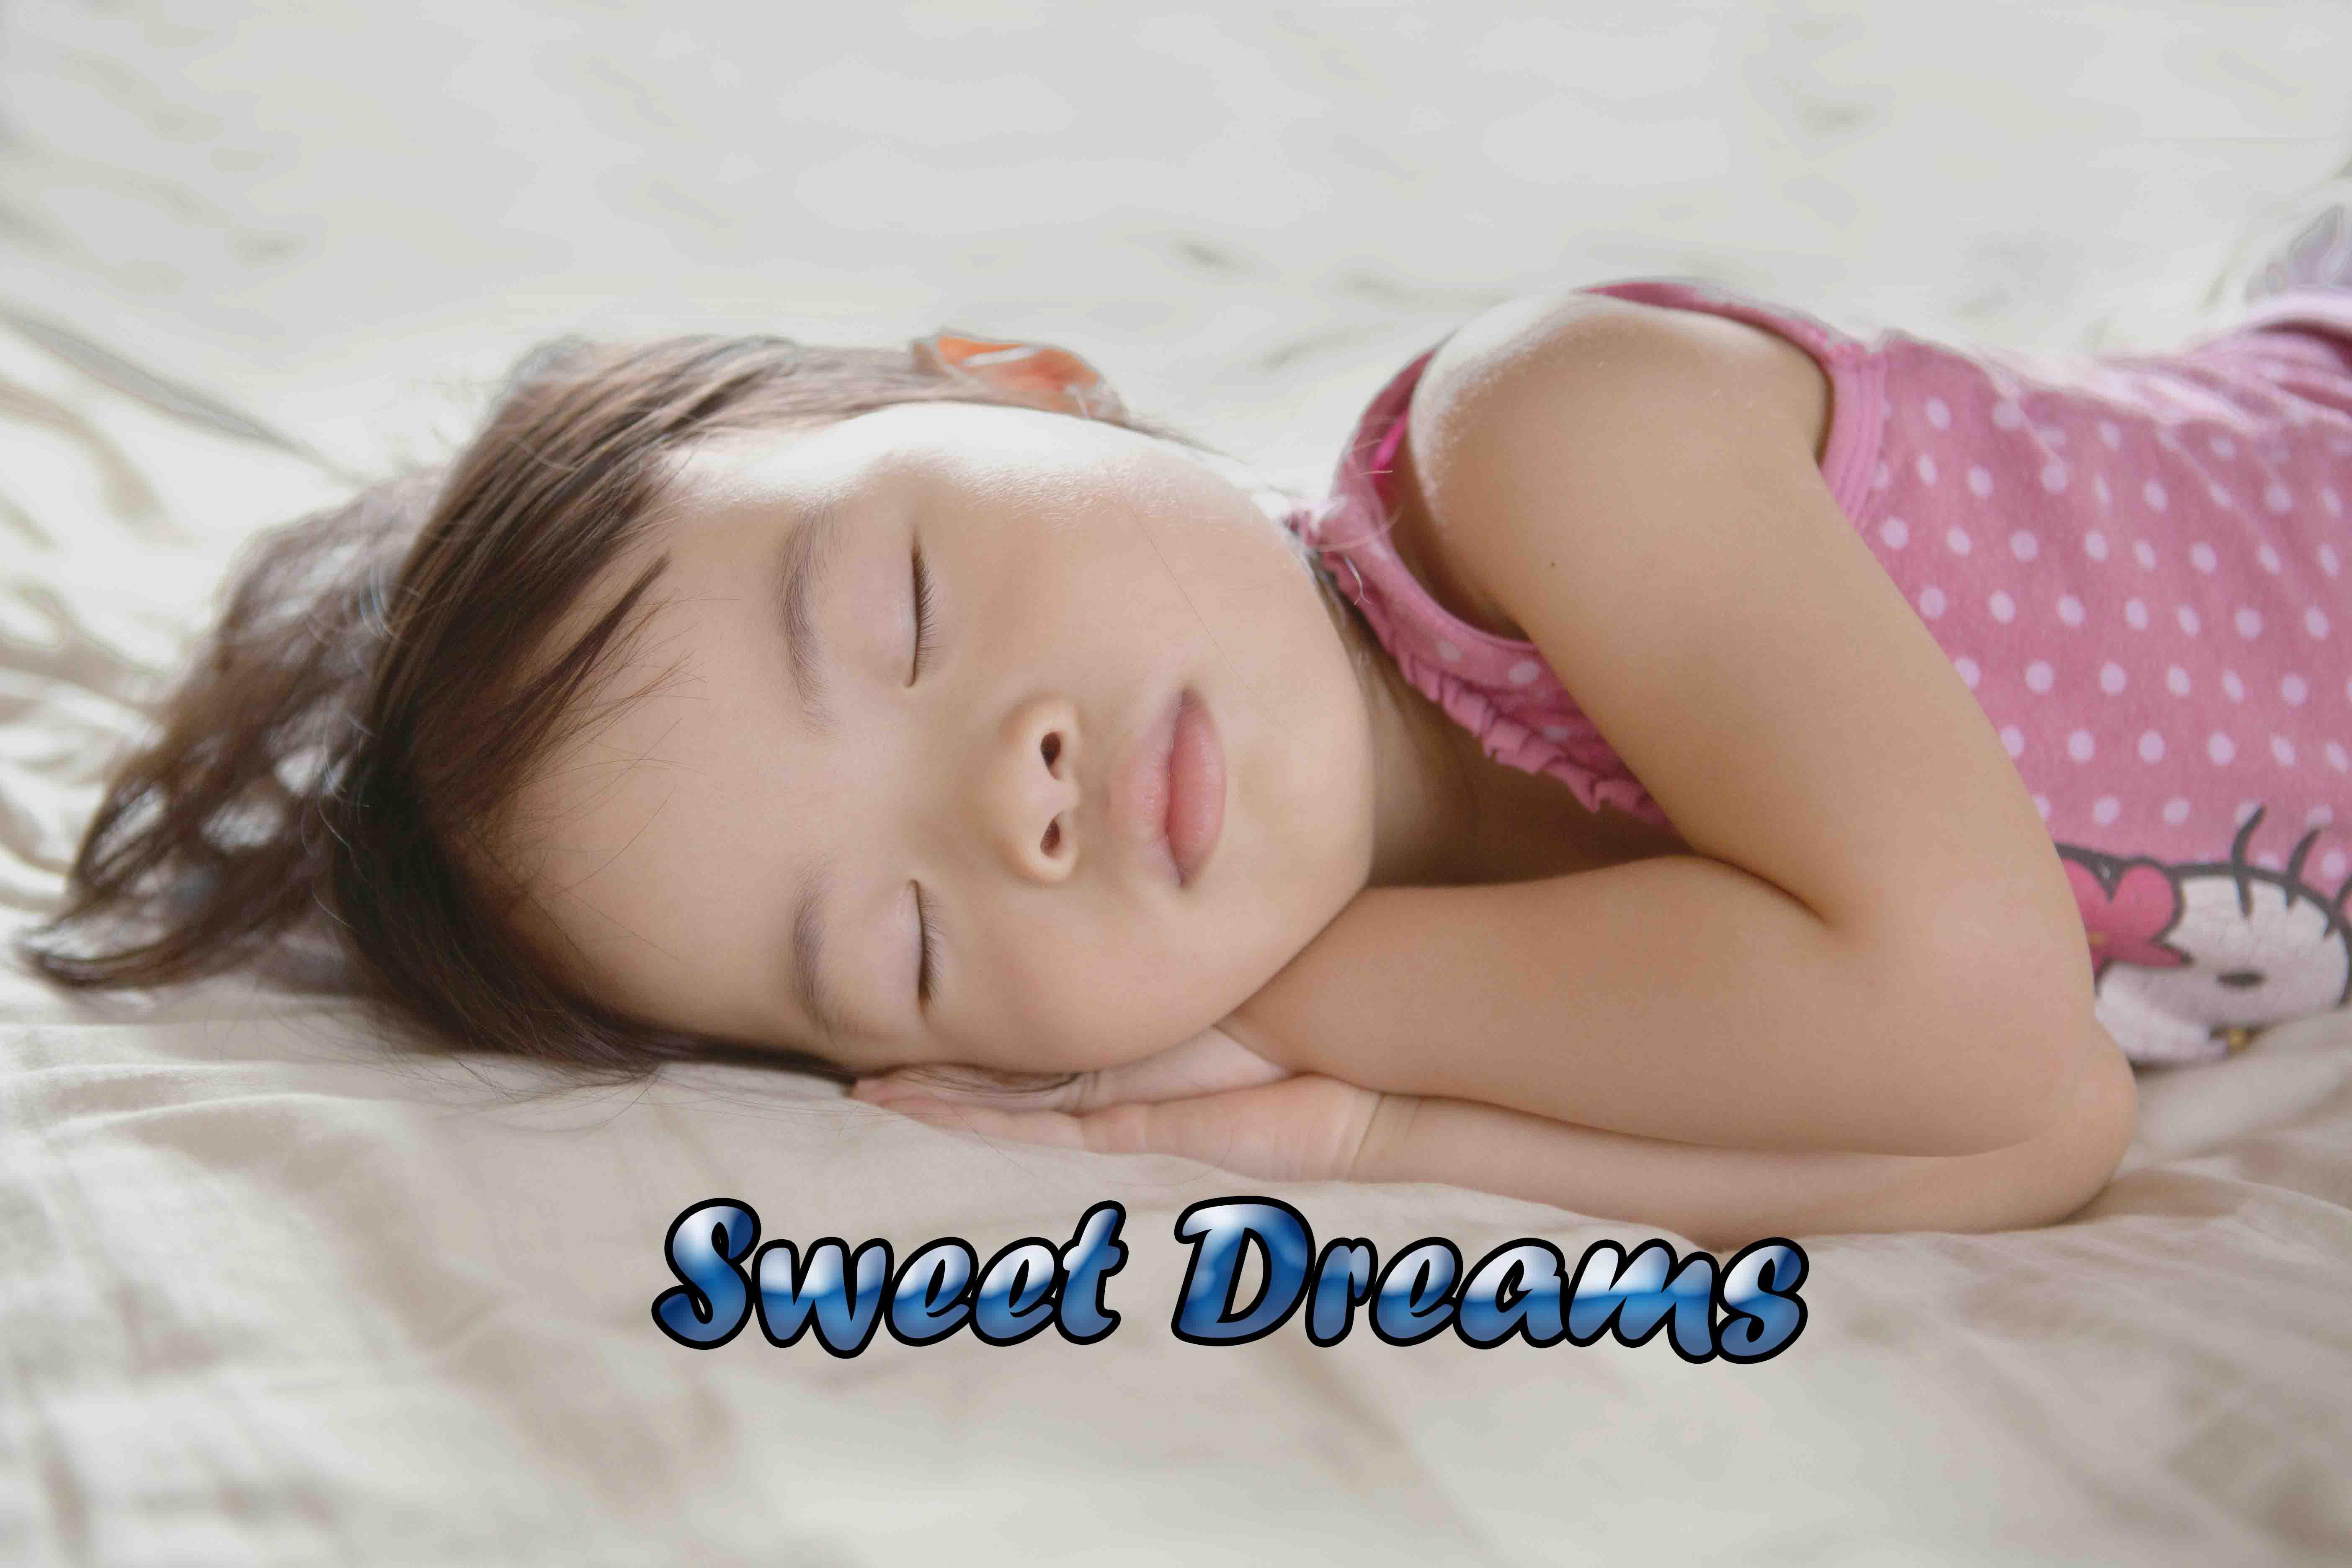 Wallpaper download good night - Good Night Wallpaper For Cute Boy Flavourspk